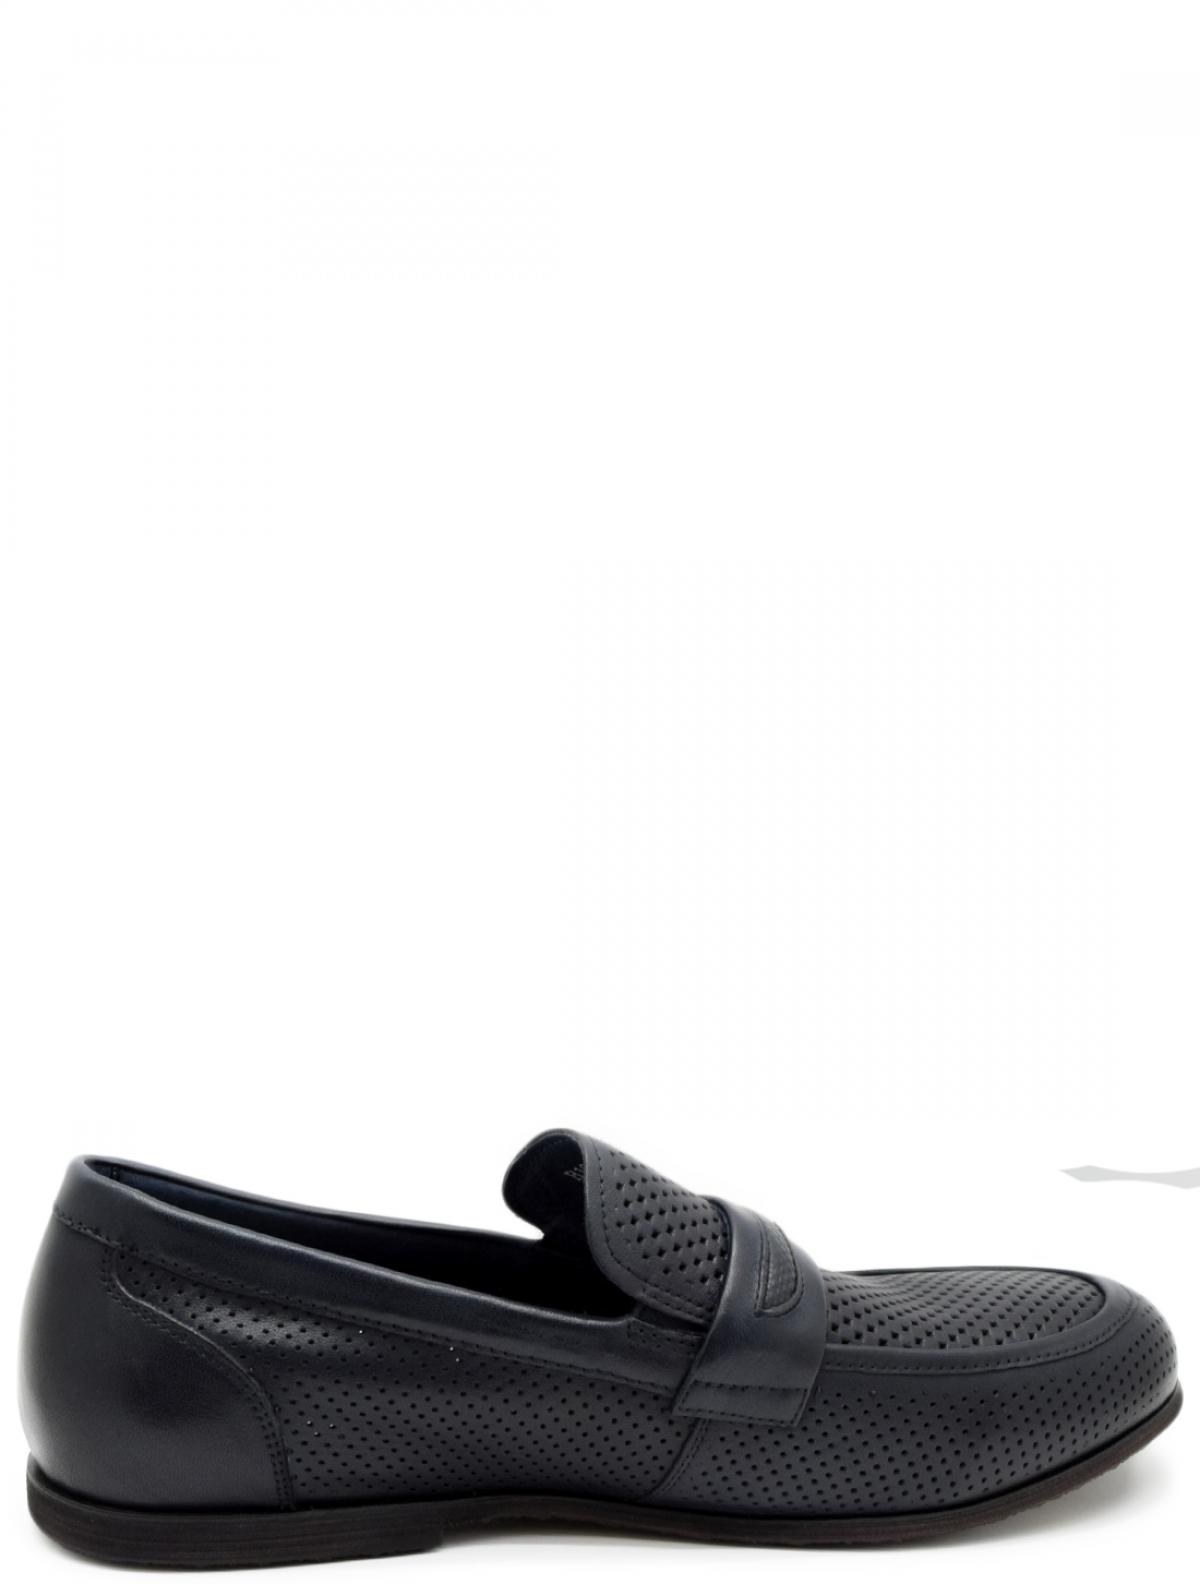 Rosconi B180-D7-HP4-6716C мужские туфли